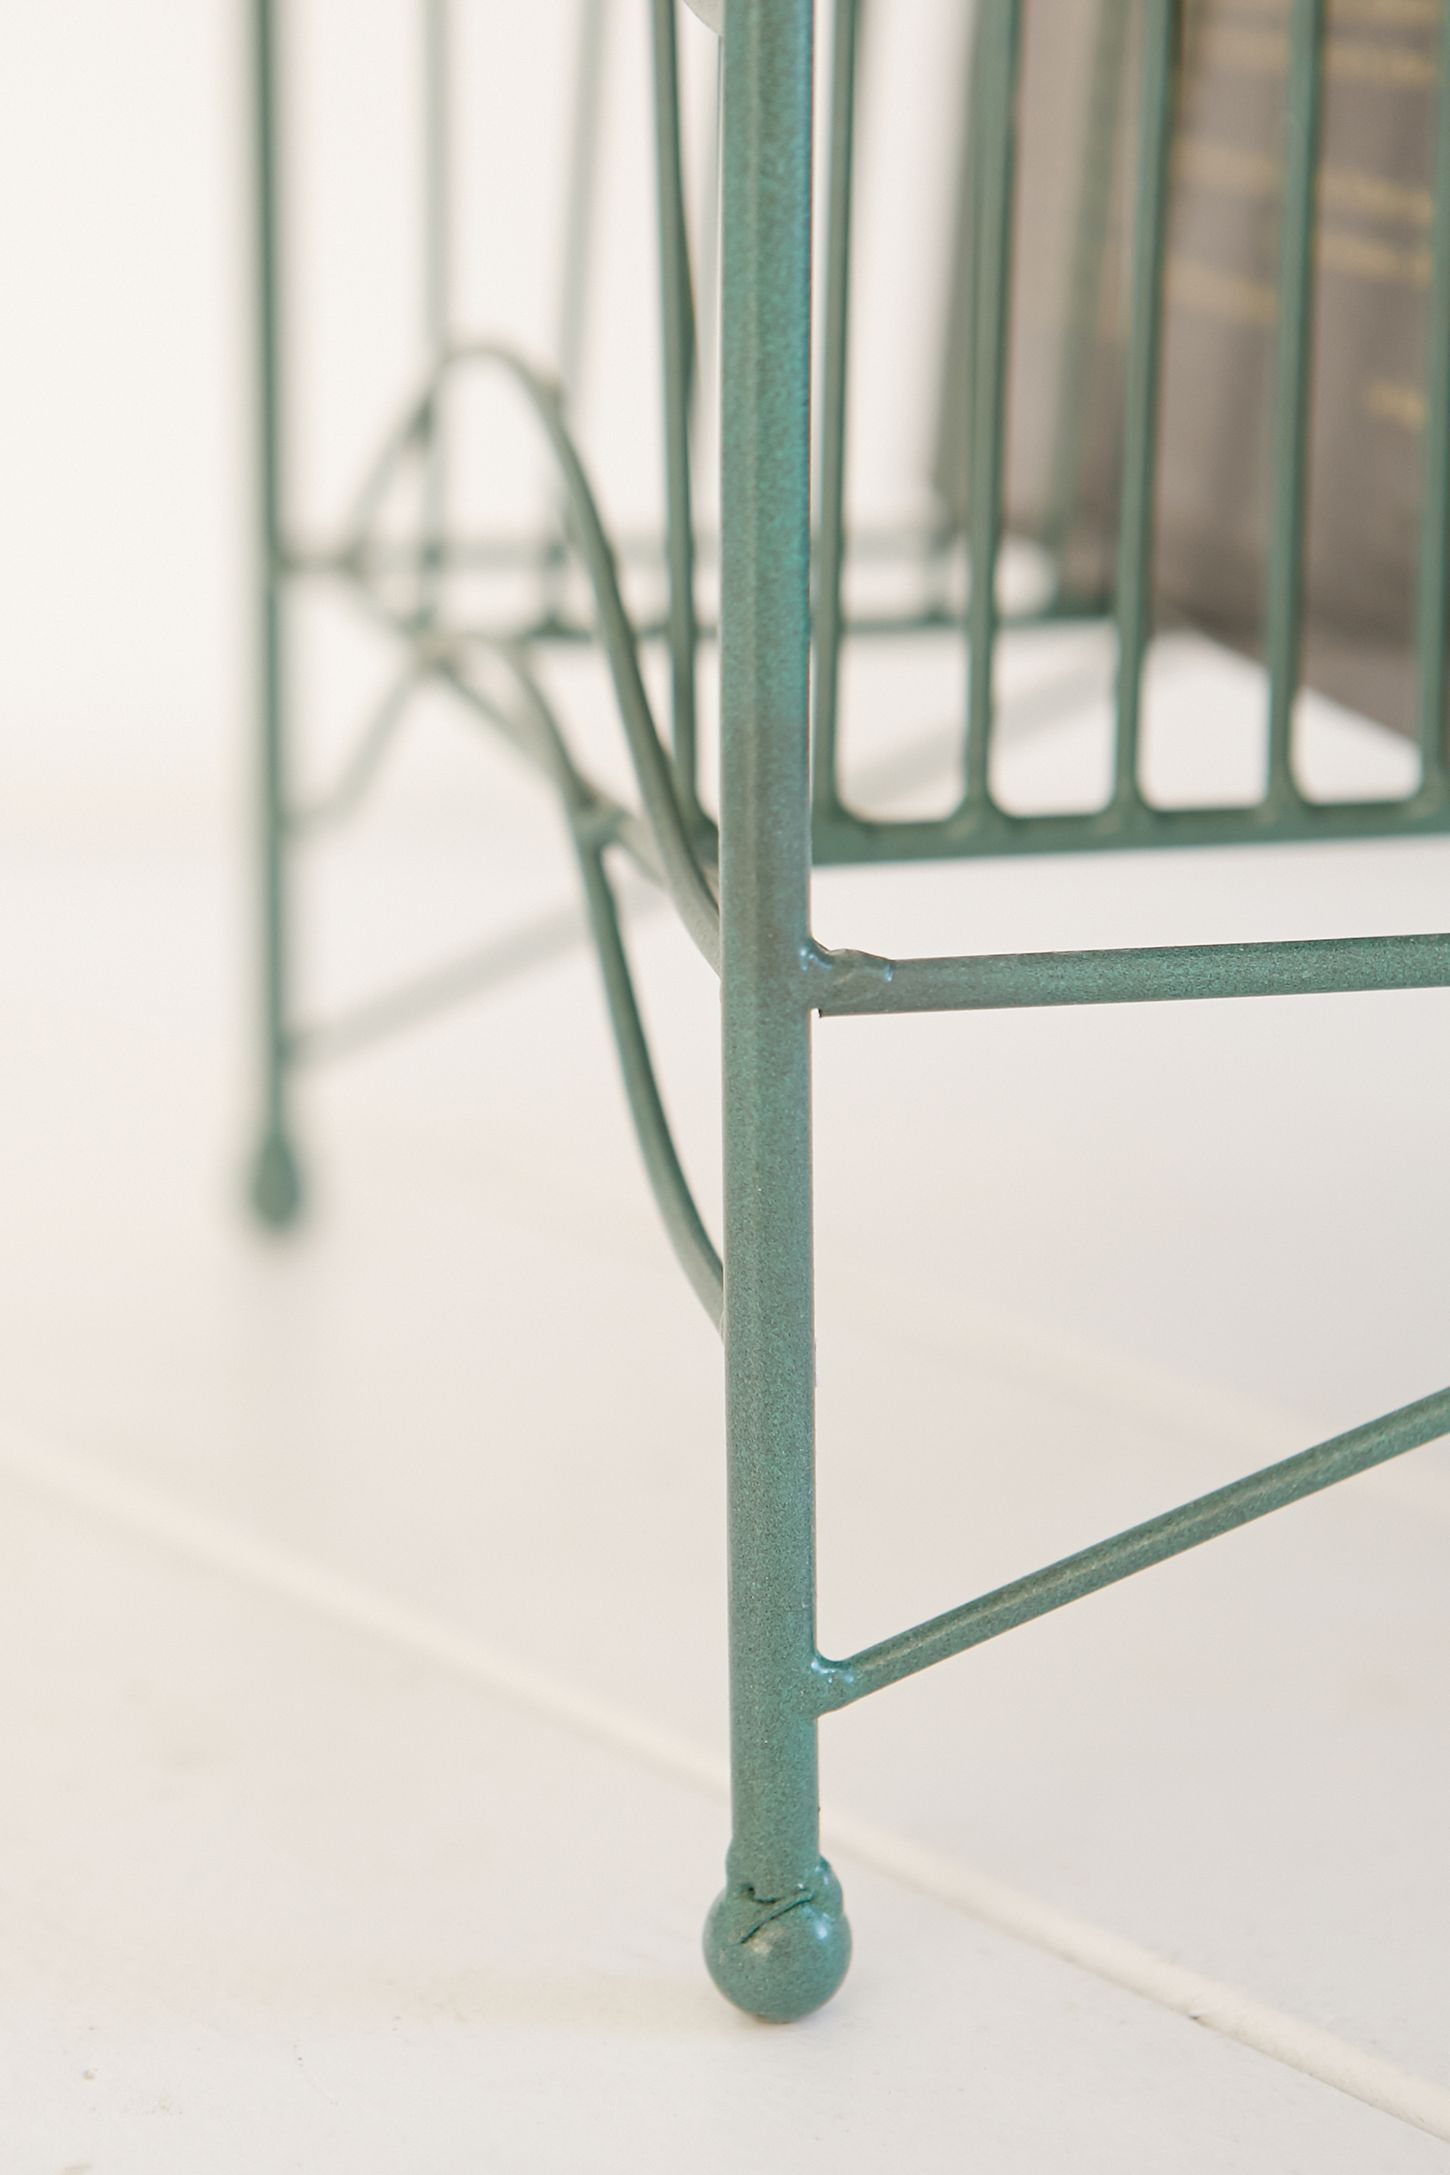 organizer shelf cube furniture album storage importhubviewitem black geb record rack cabinet vinyl